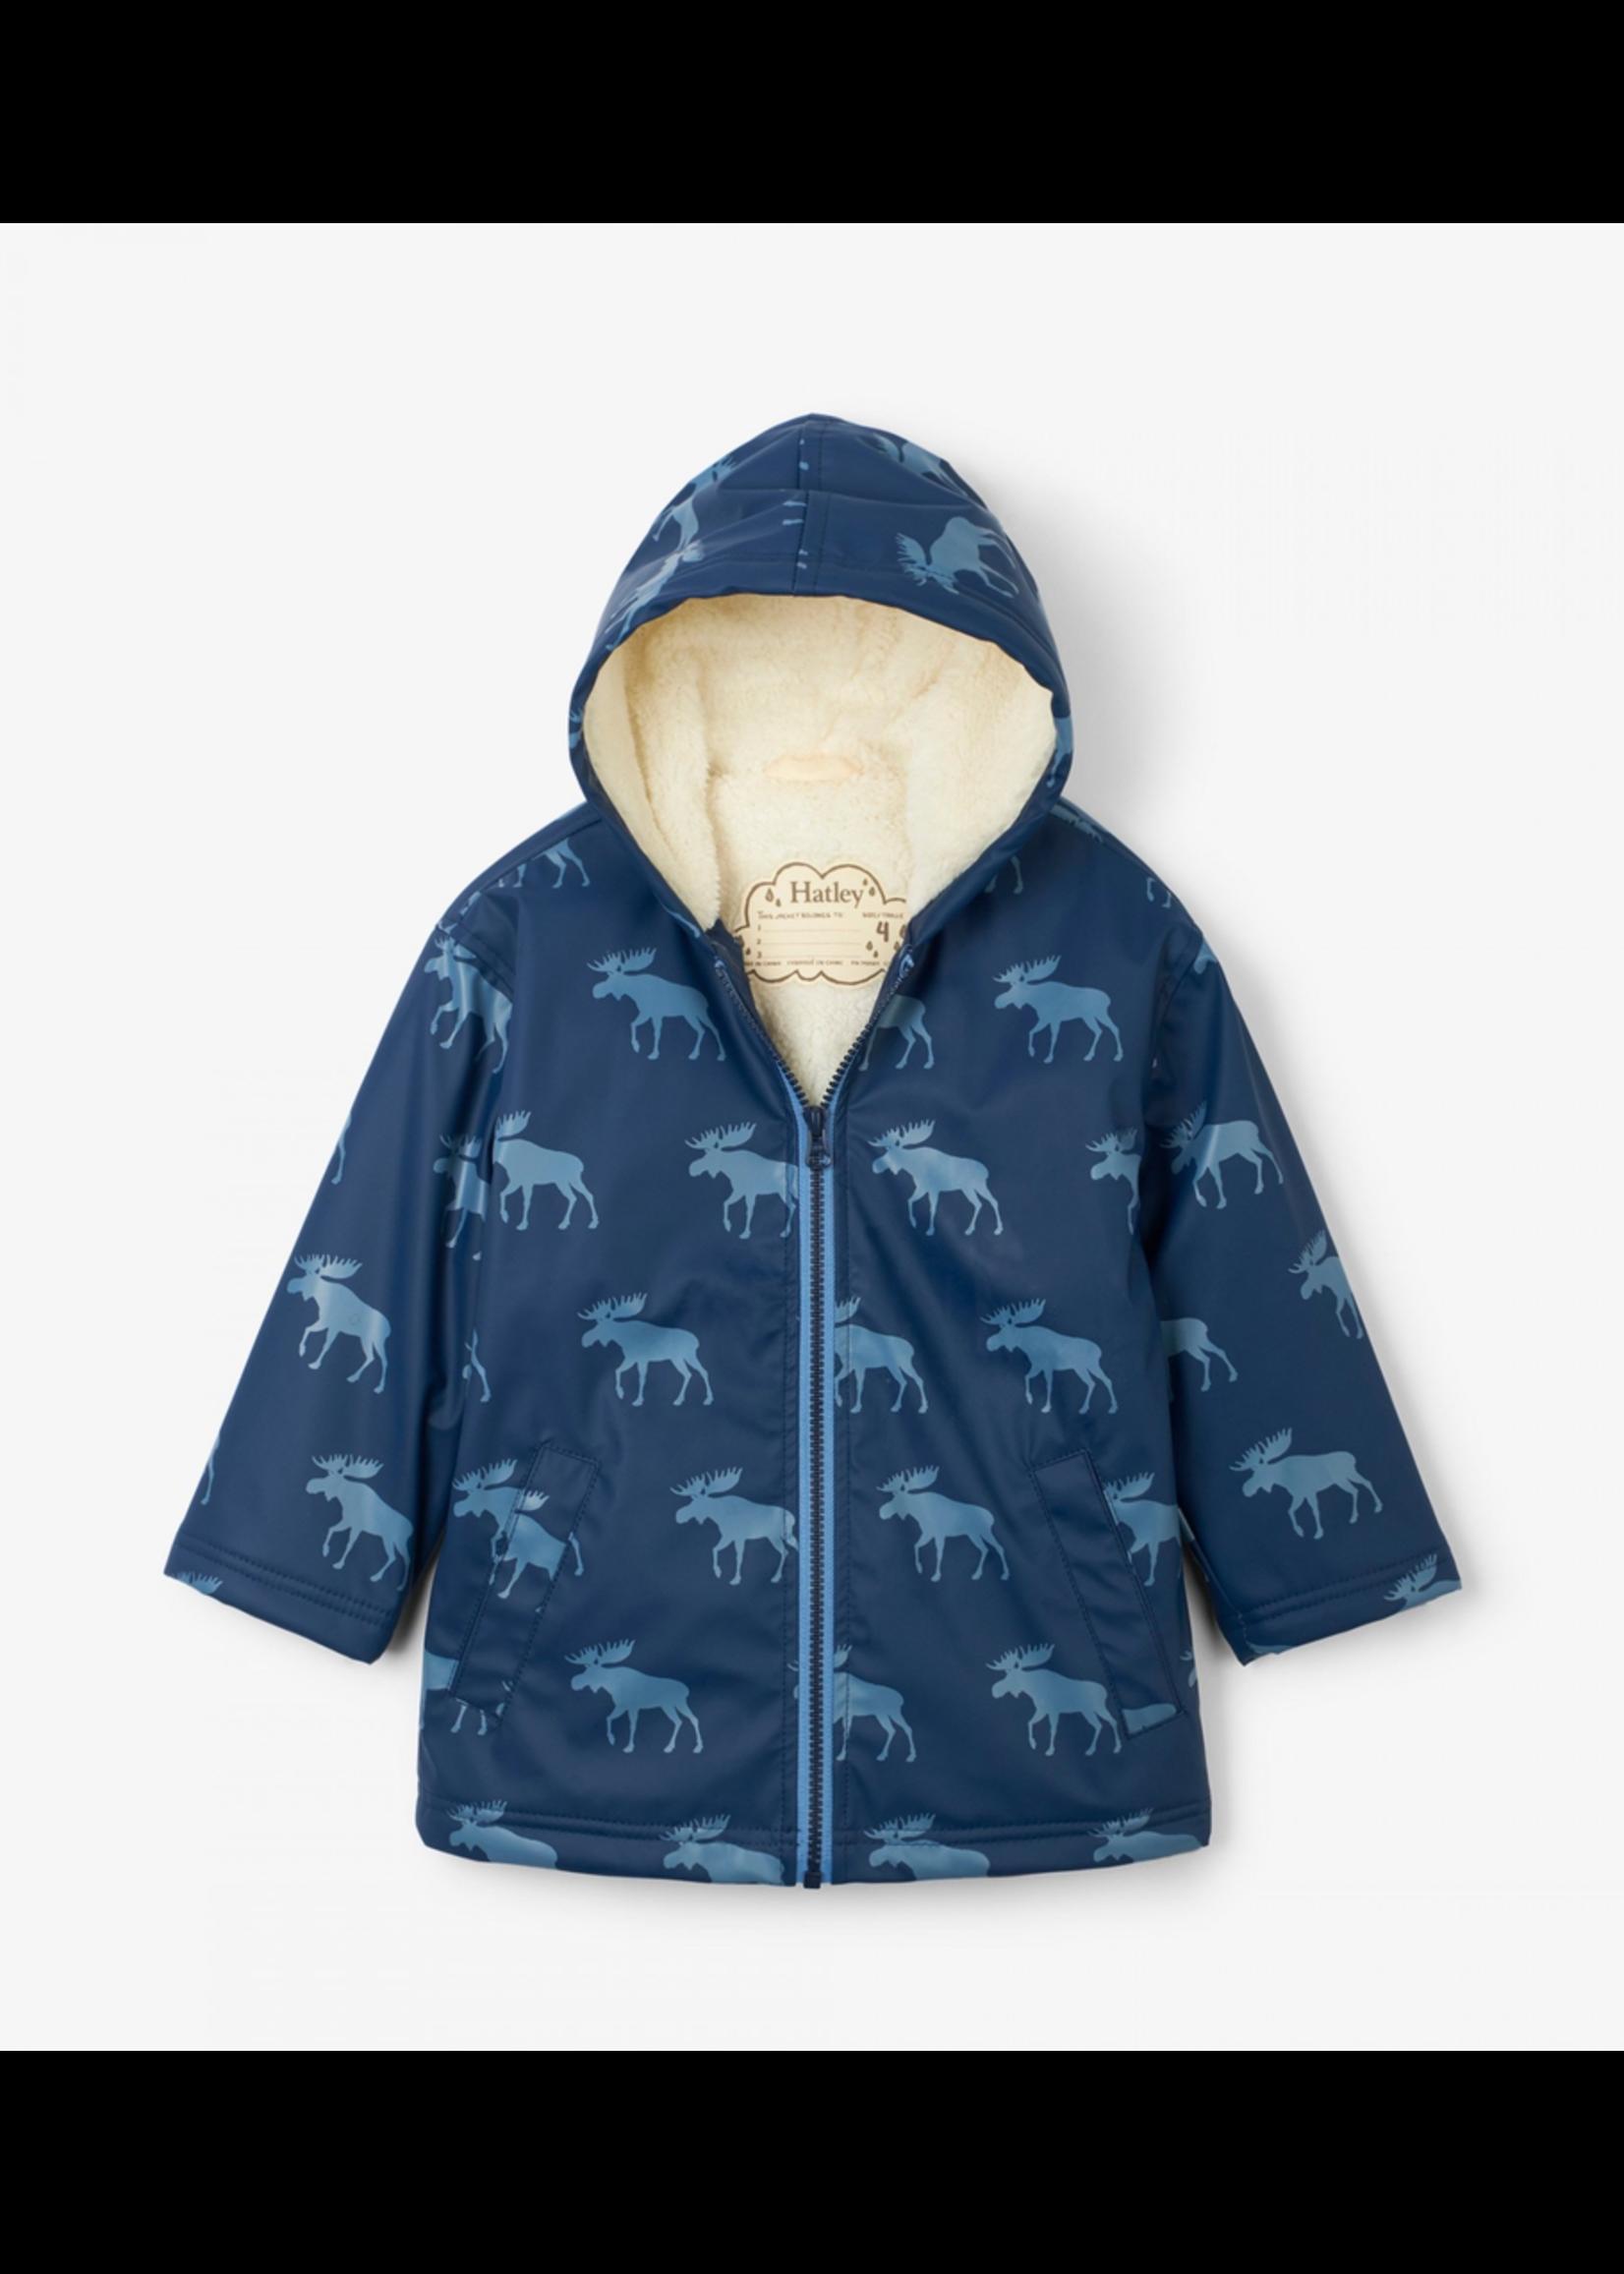 Hatley Hatley, Moose Silhouettes Sherpa Lined Splash Jacket for Boy